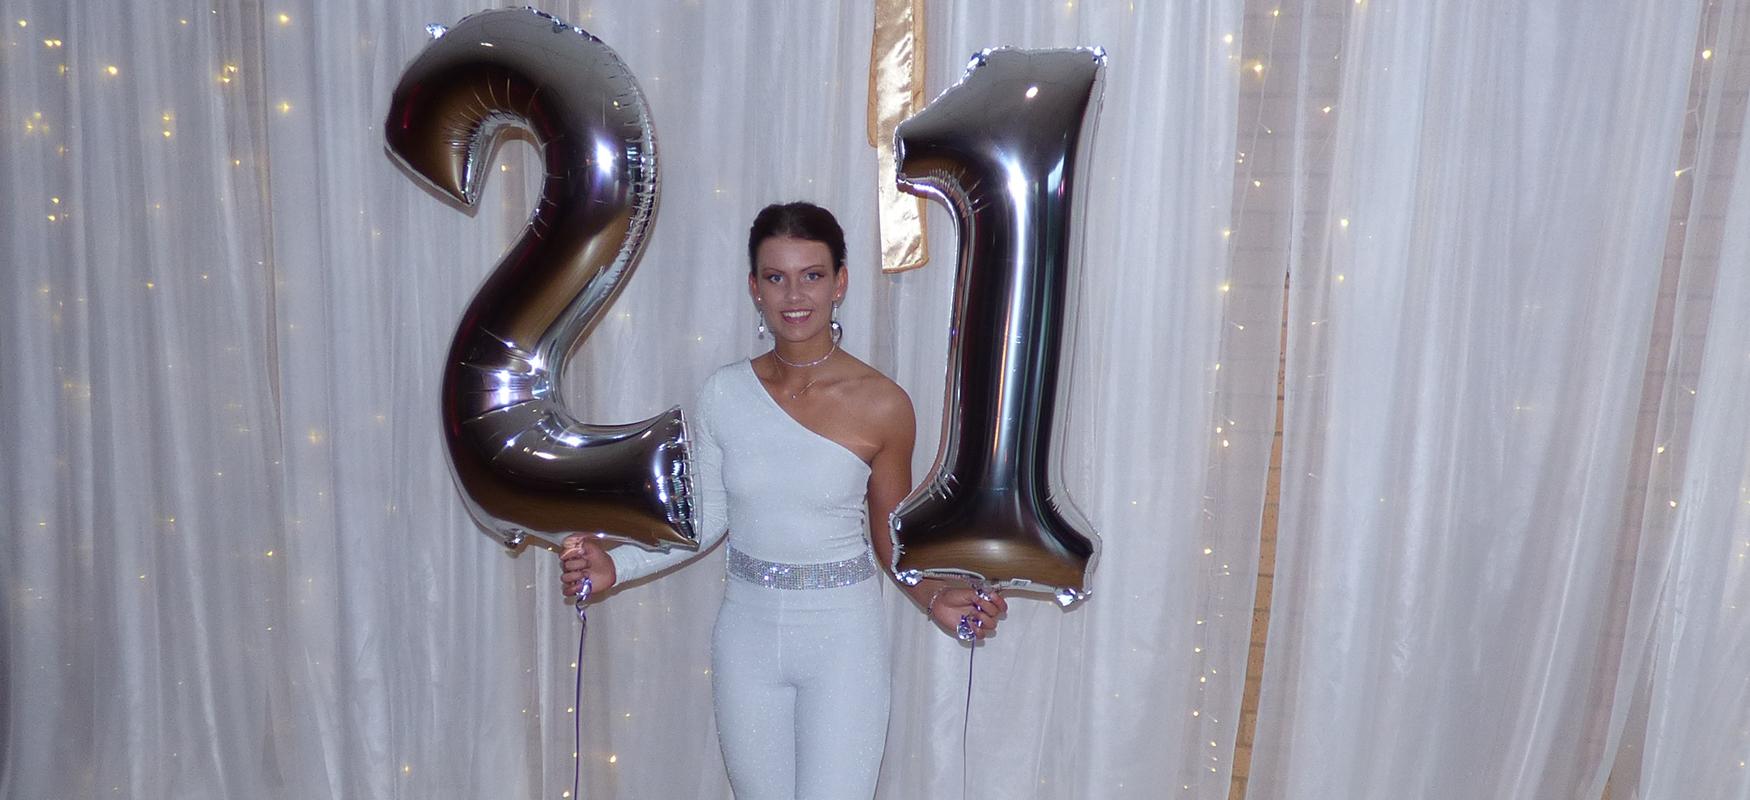 21st-birthday-party-dj